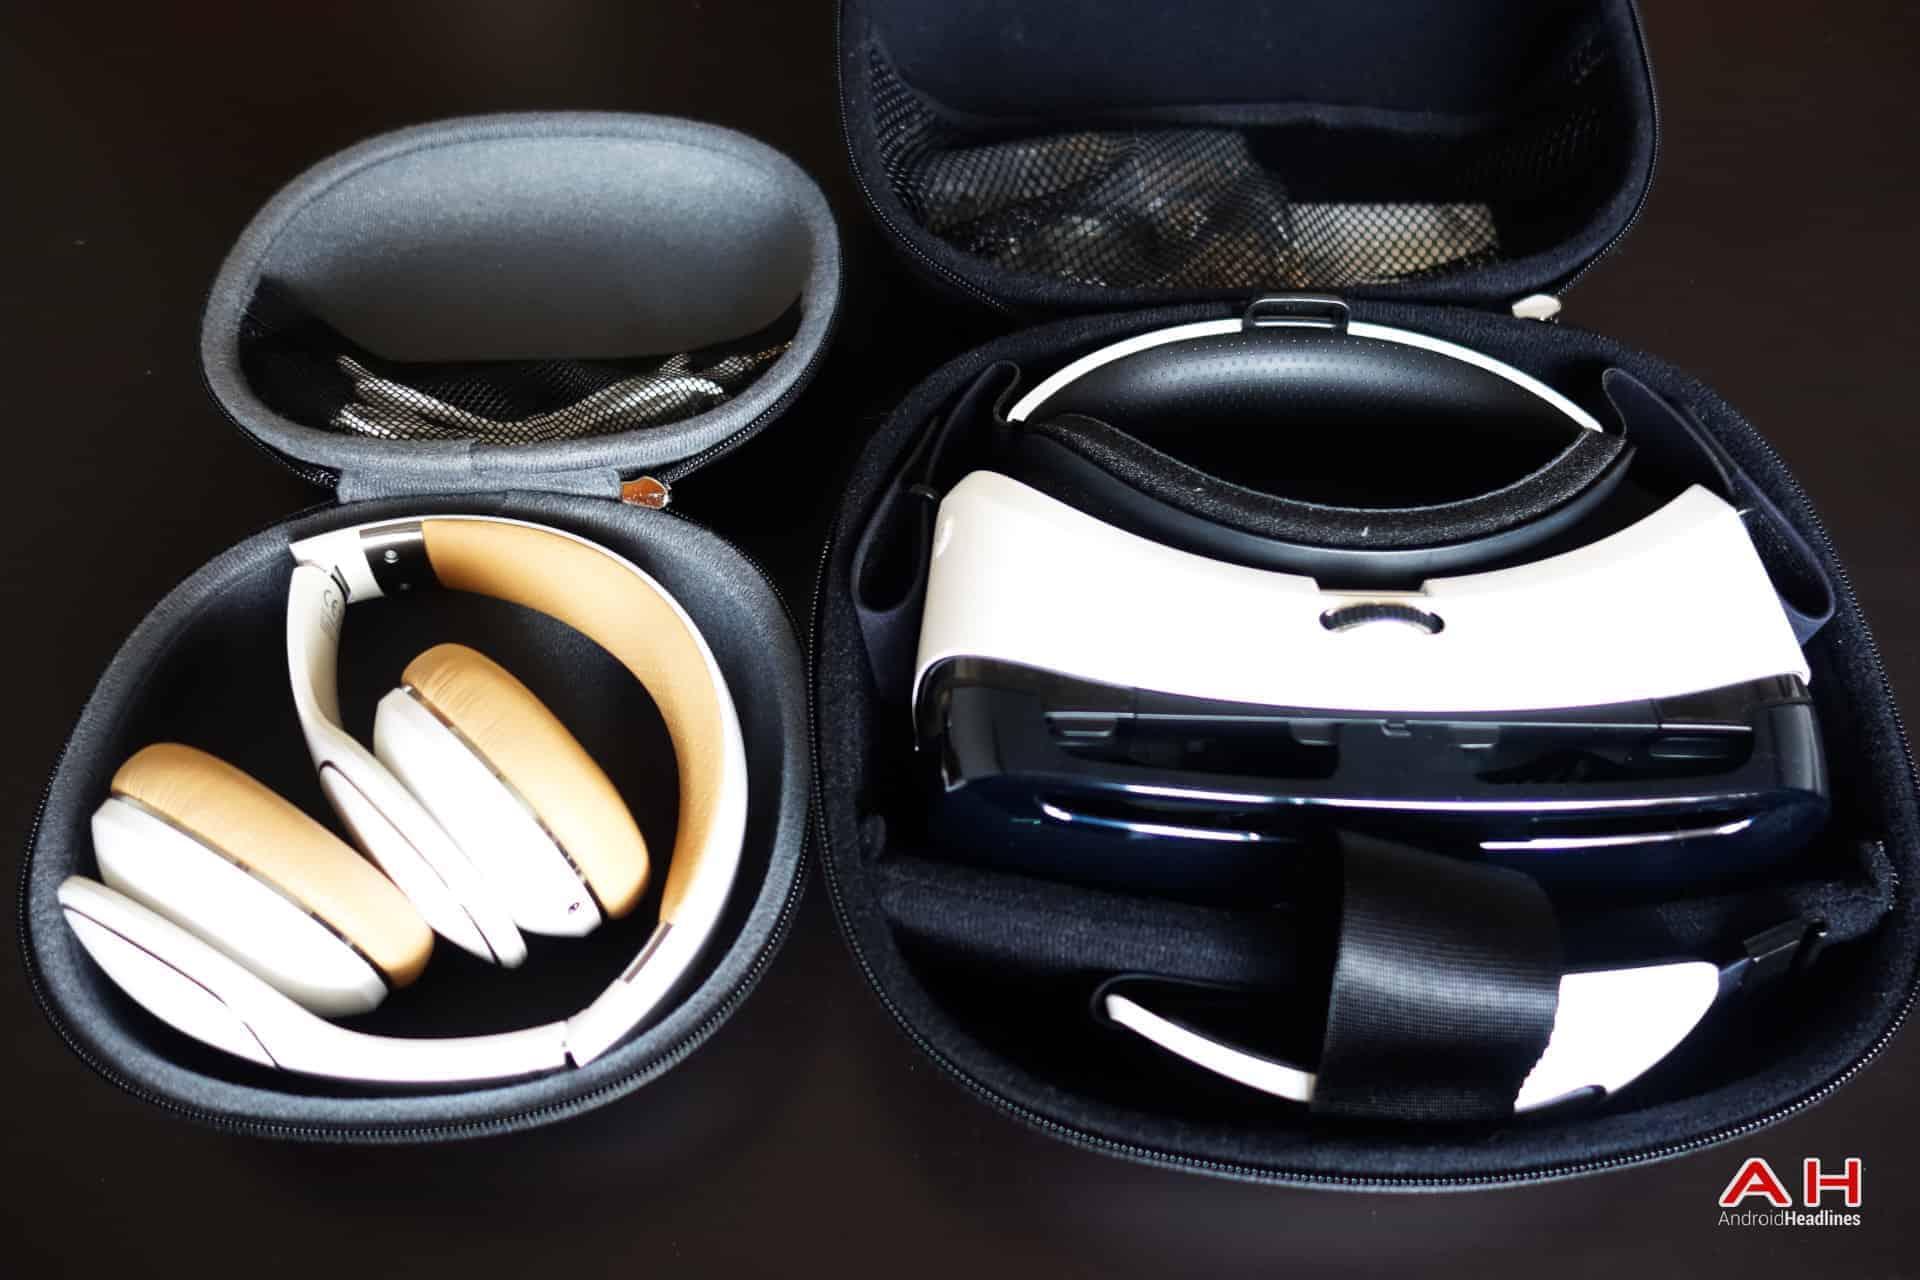 AH Samsung Gear VR 2